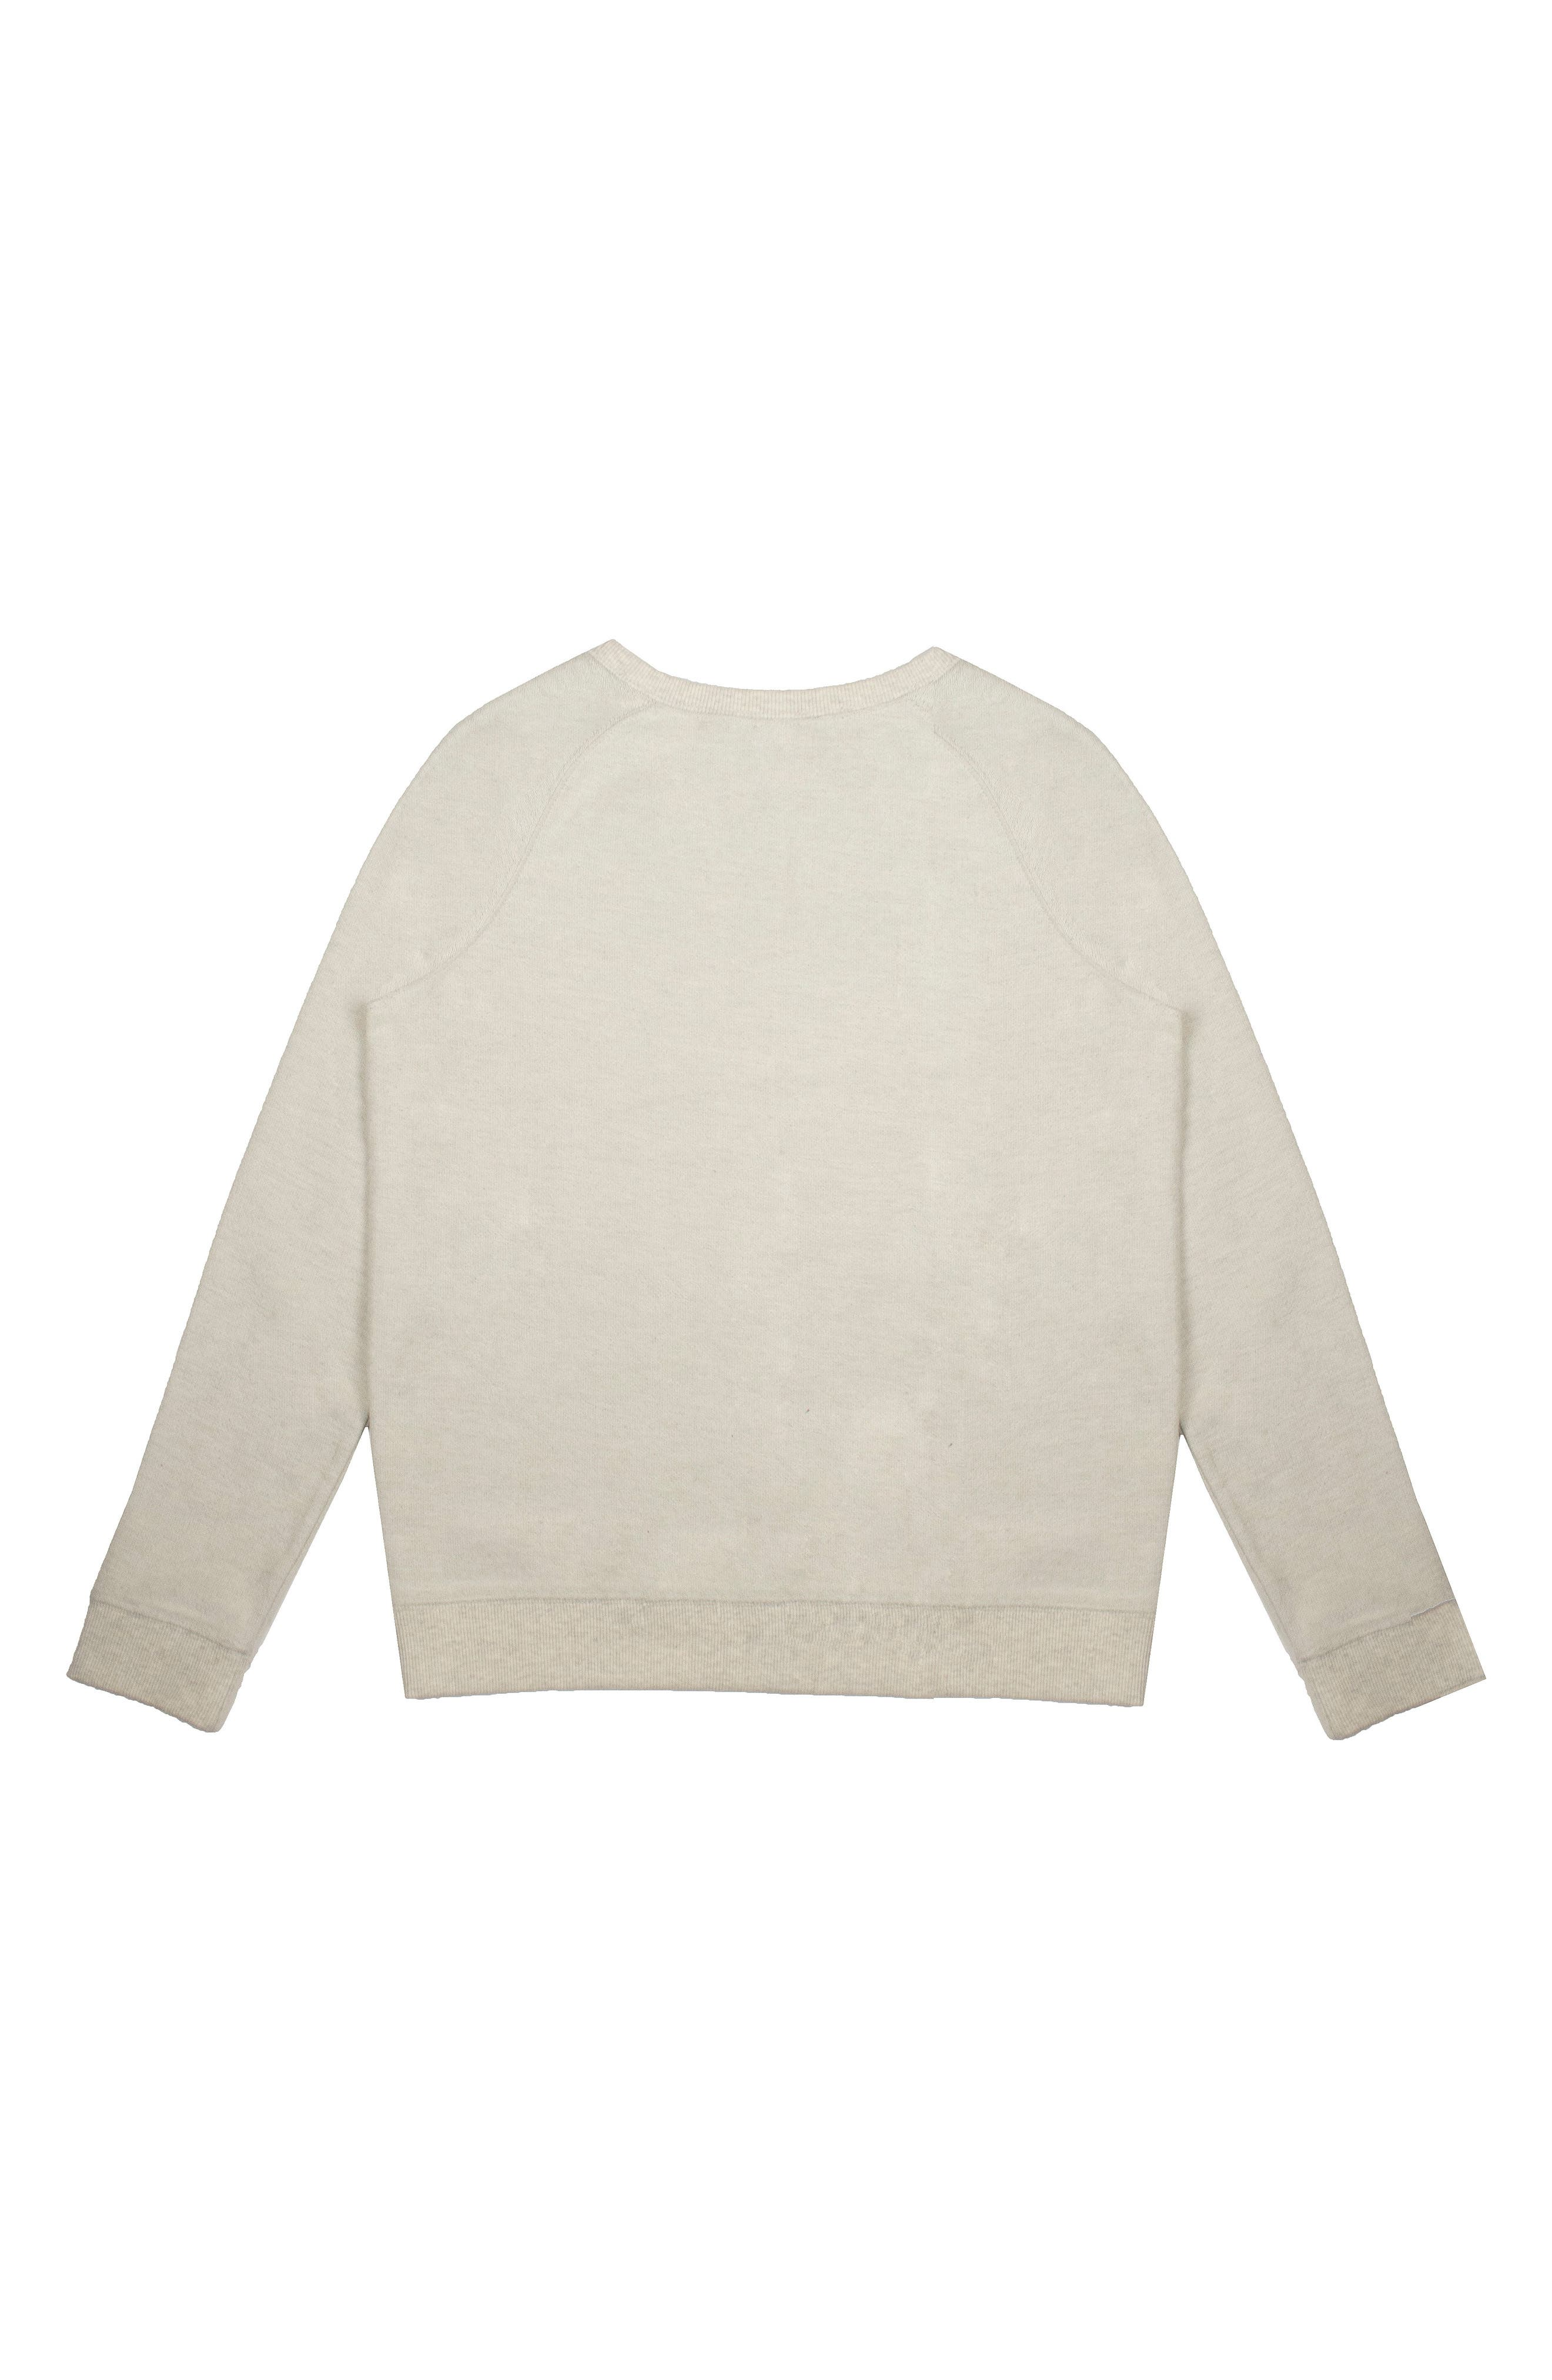 Vibes Graphic Sweatshirt,                             Alternate thumbnail 2, color,                             Quicksilver